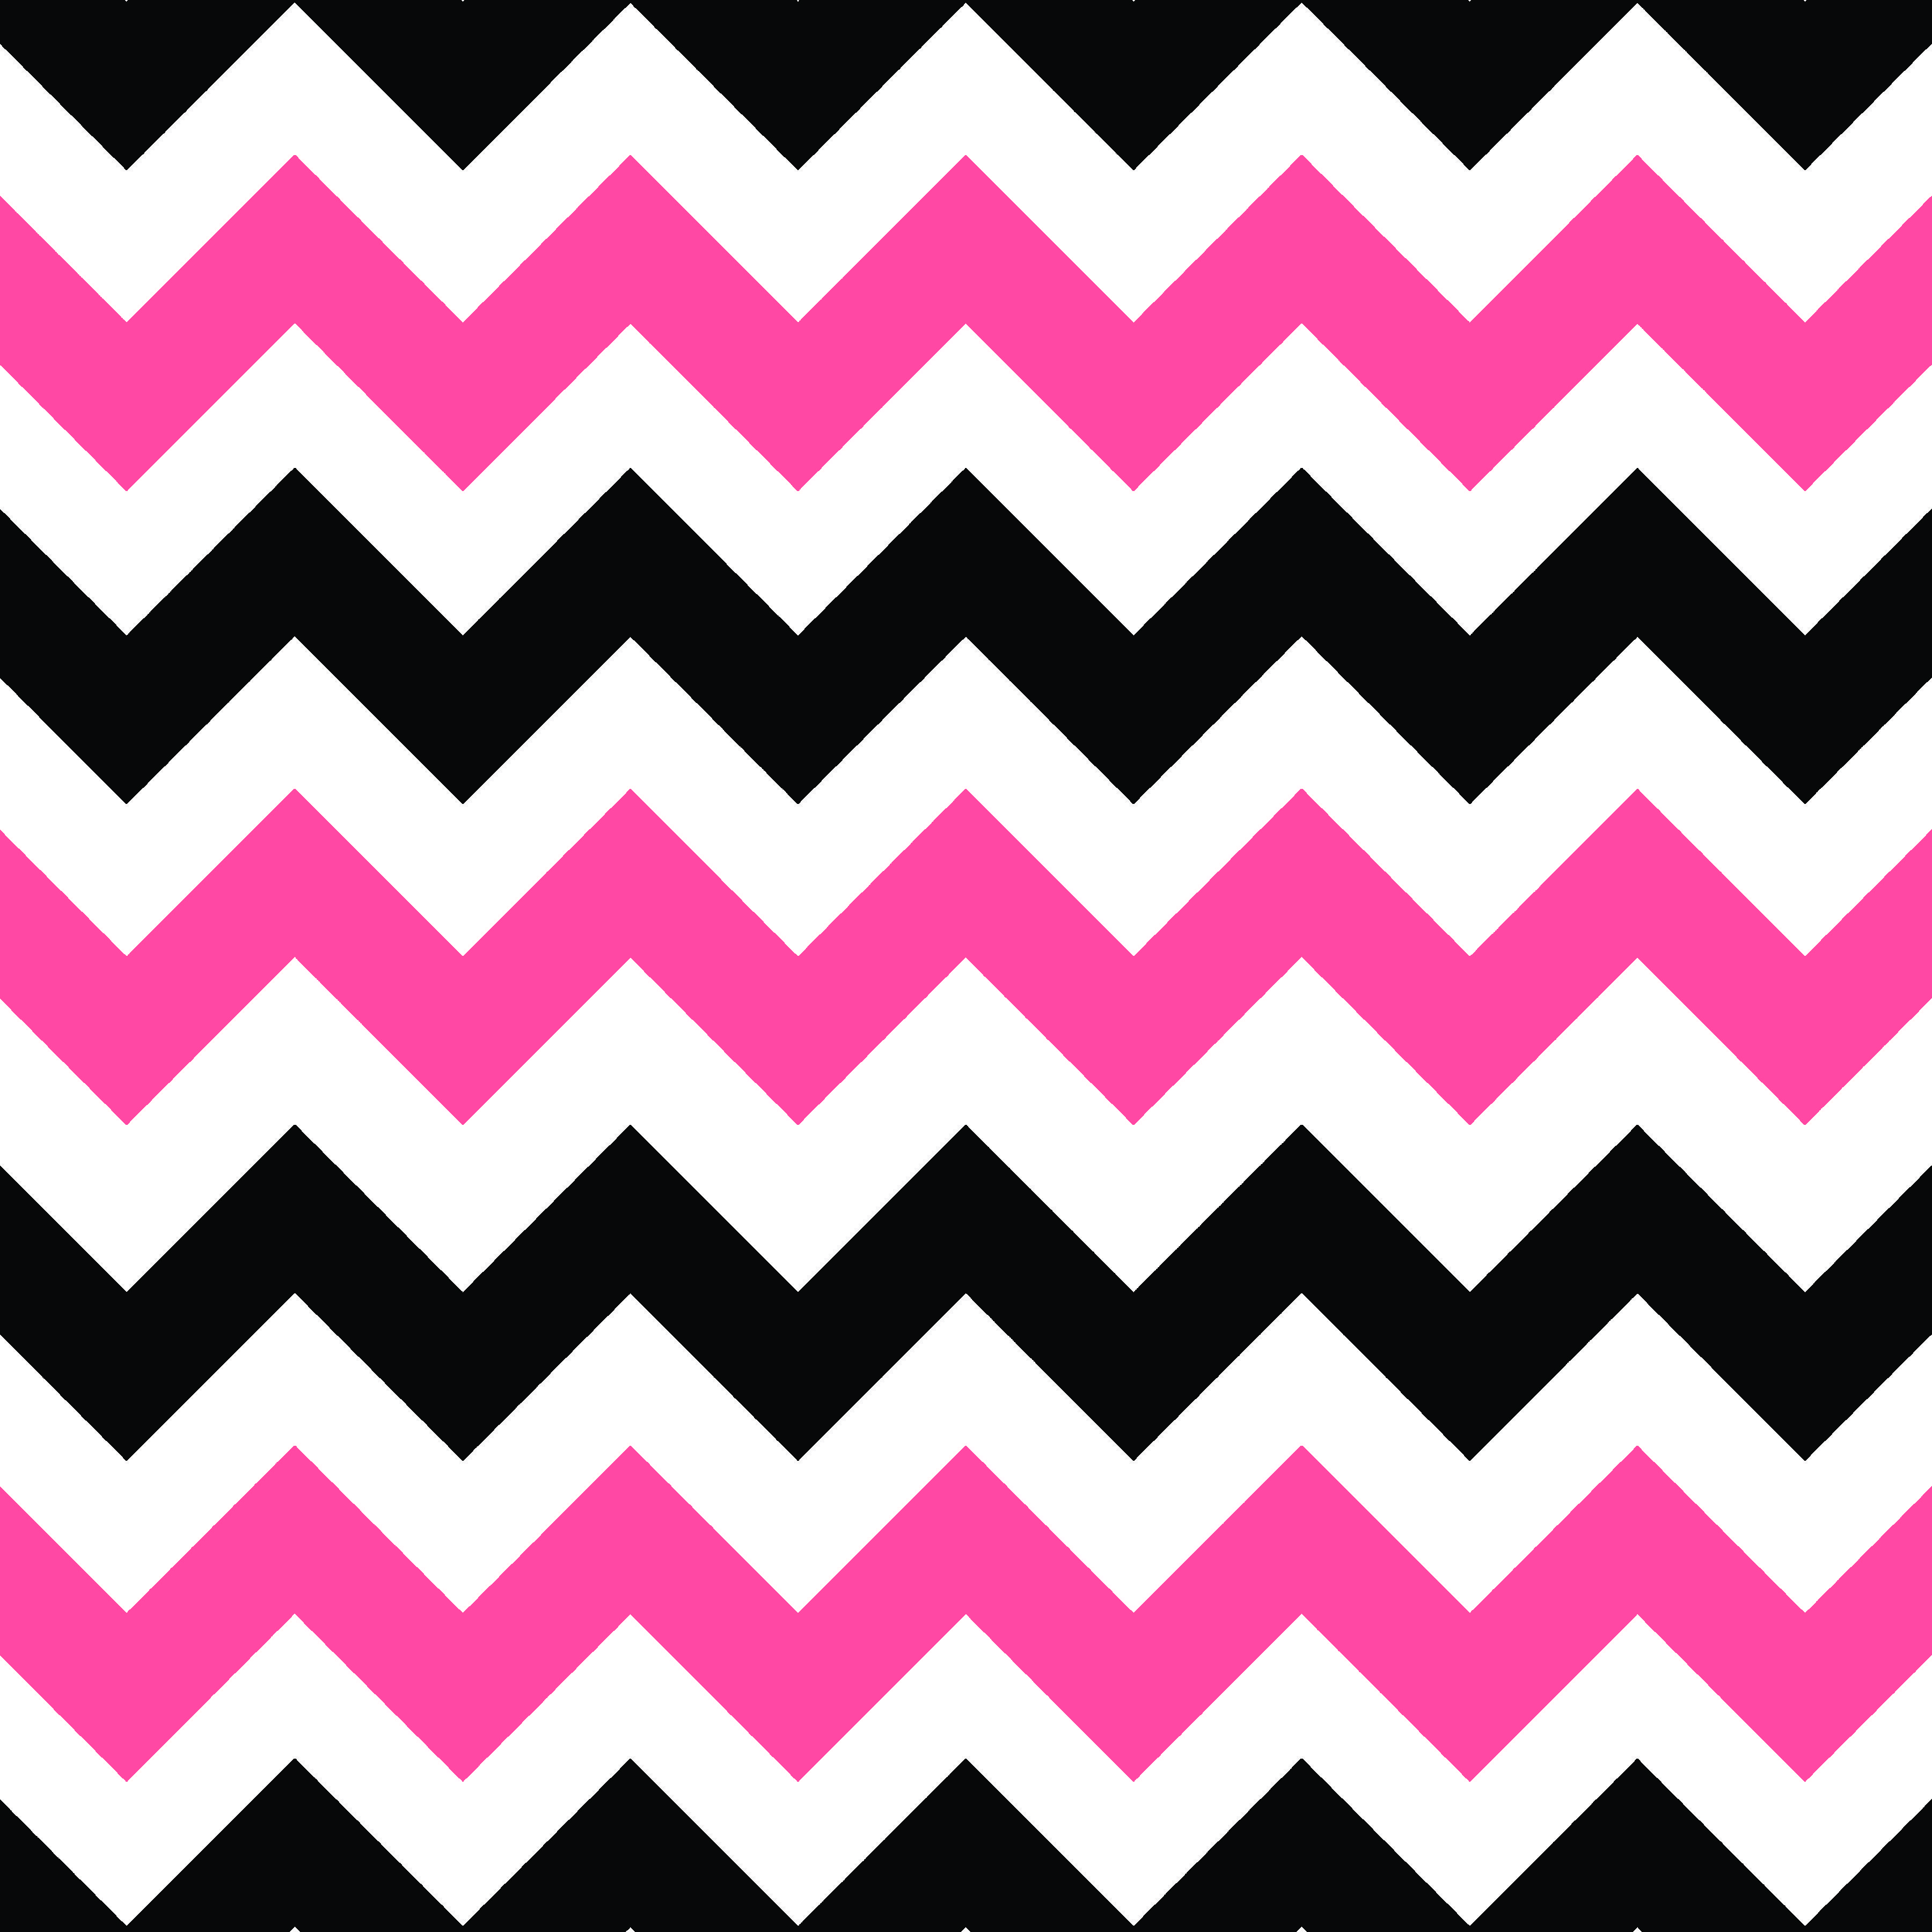 Pink black and white sheveron celli pinterest pink for Chevron wallpaper home uk